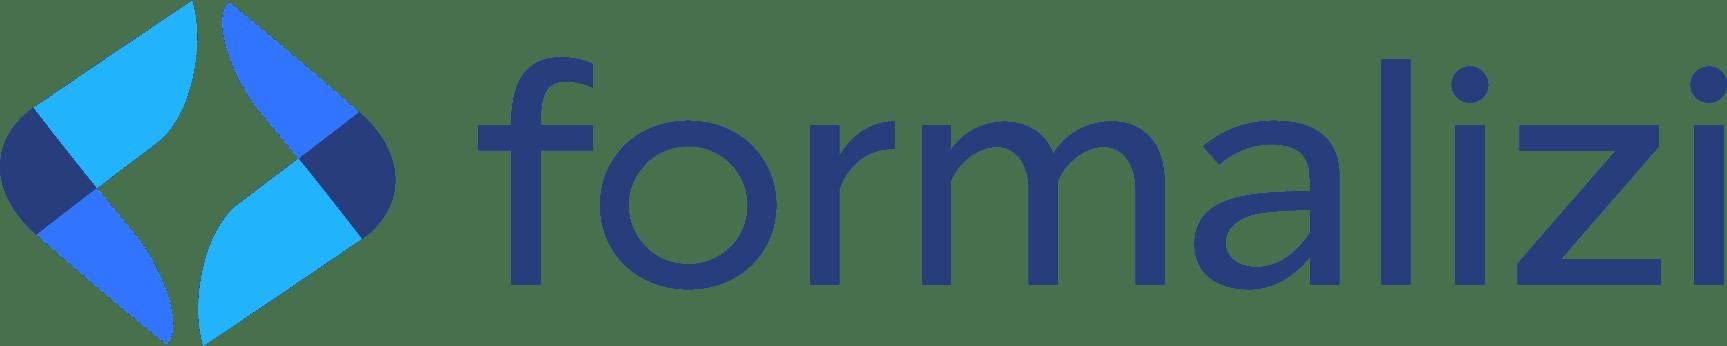 Formalizi logo